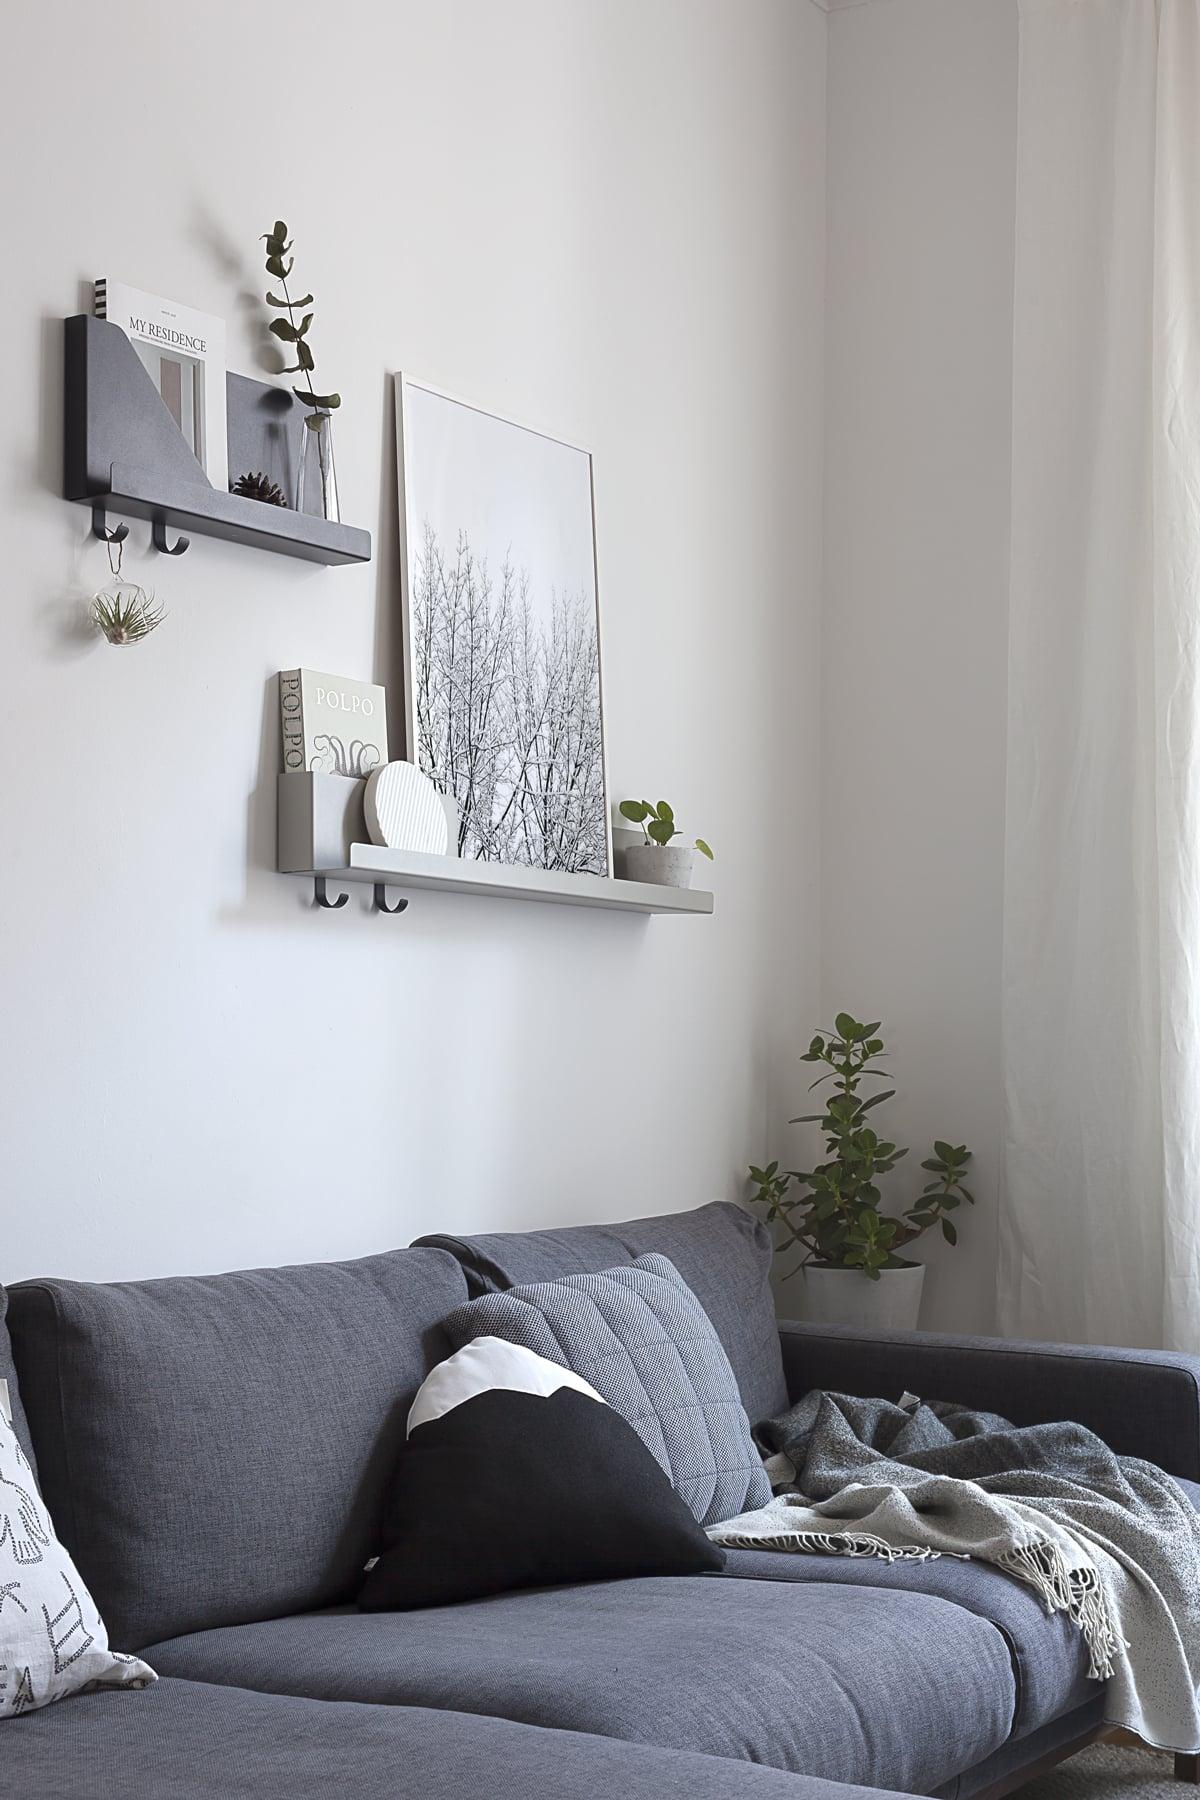 Muuto Folded Shelves Coco Lapine Designcoco Lapine Design